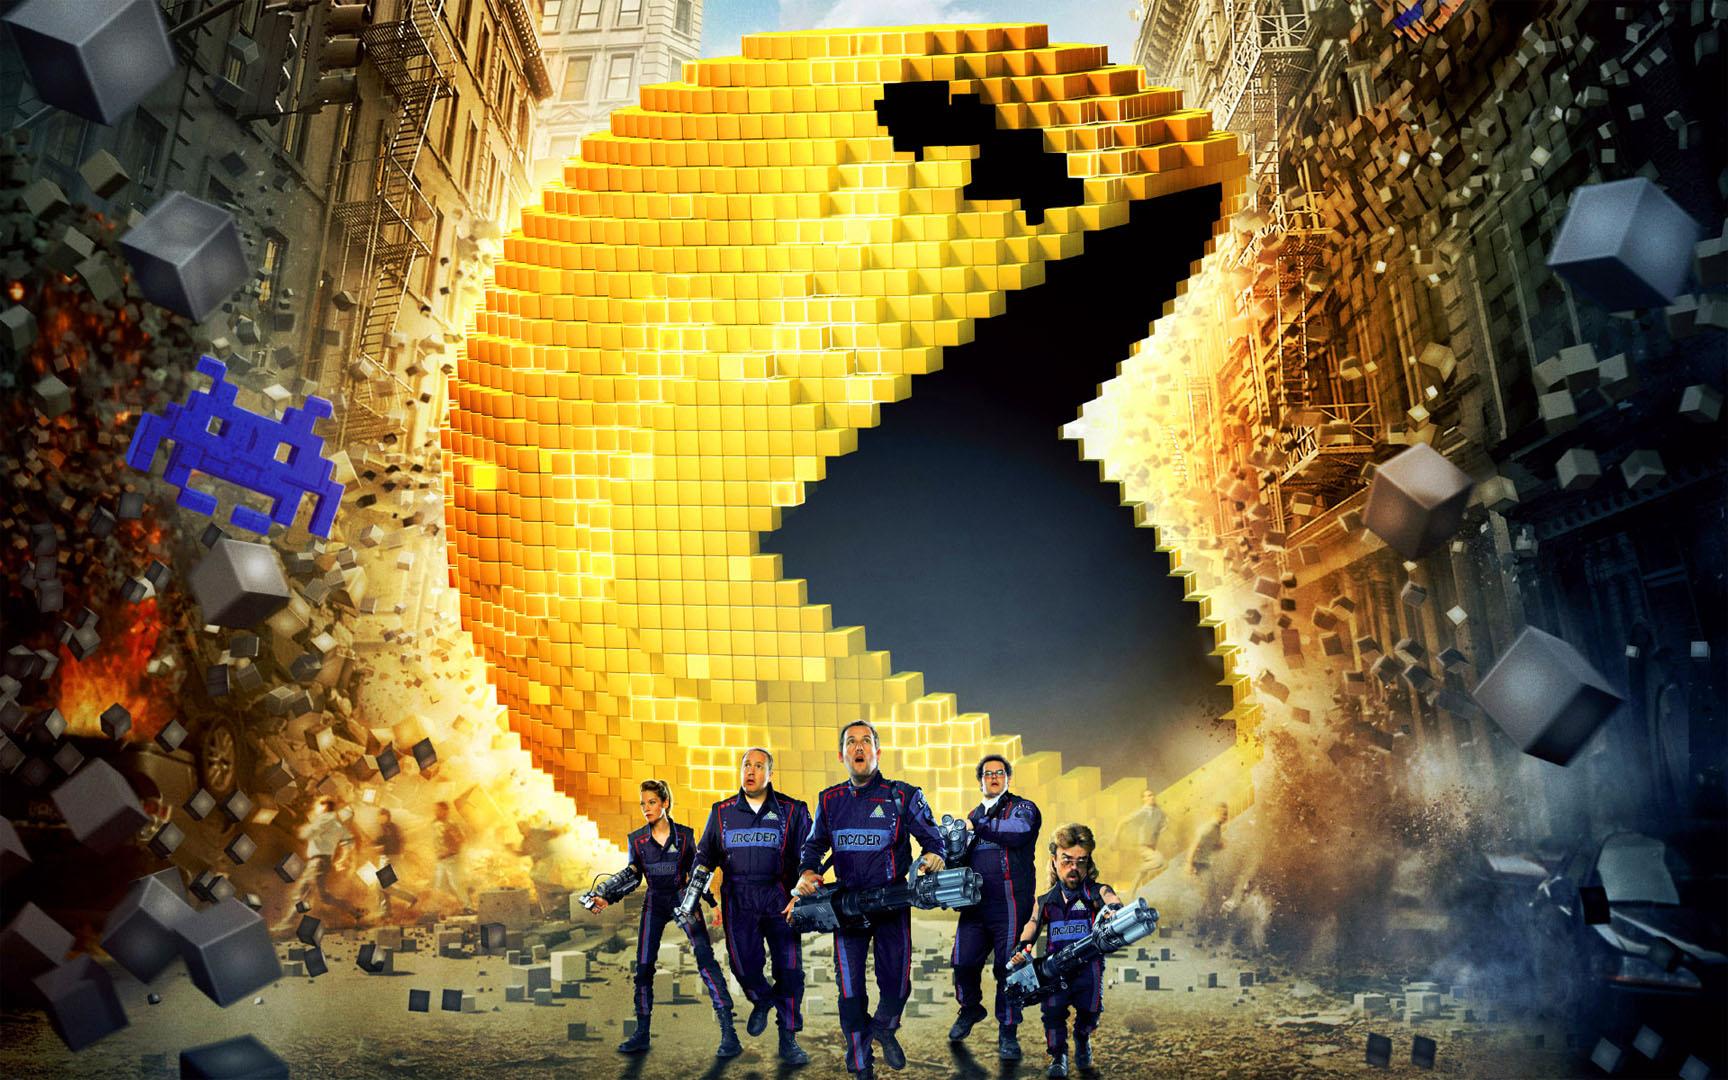 2015 Pixels Movie Poster Wallpaper - DreamLoveWallpapers